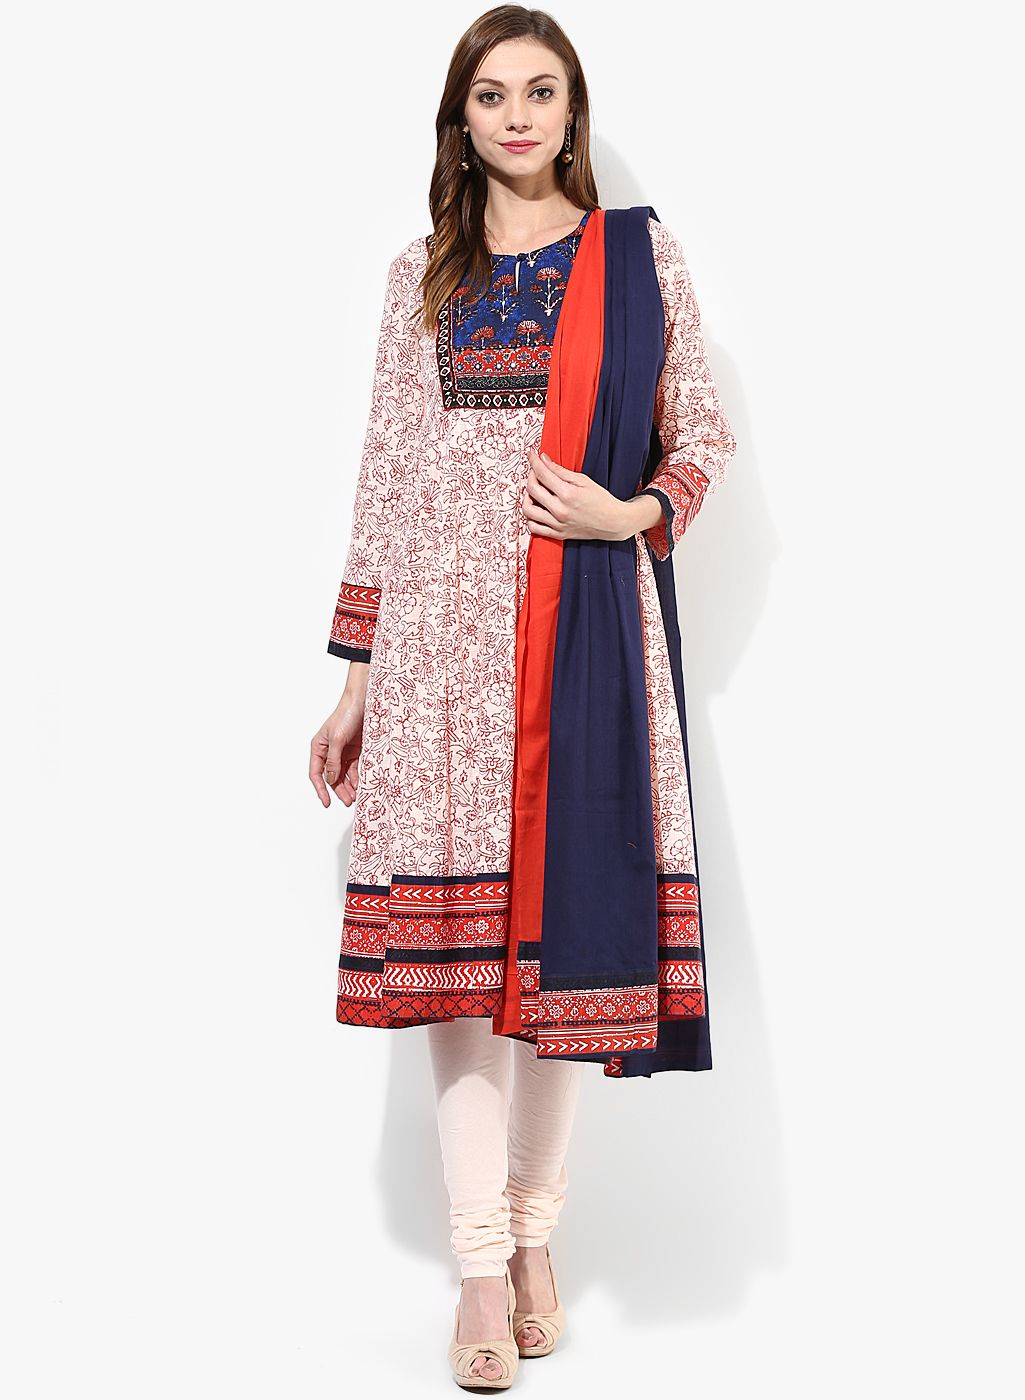 f34b066419302 Biba Off White Floral Printed Salwar Kameez Dupatta Set @Looksgud.in  #OffWhite #Floral #SalwarSuit